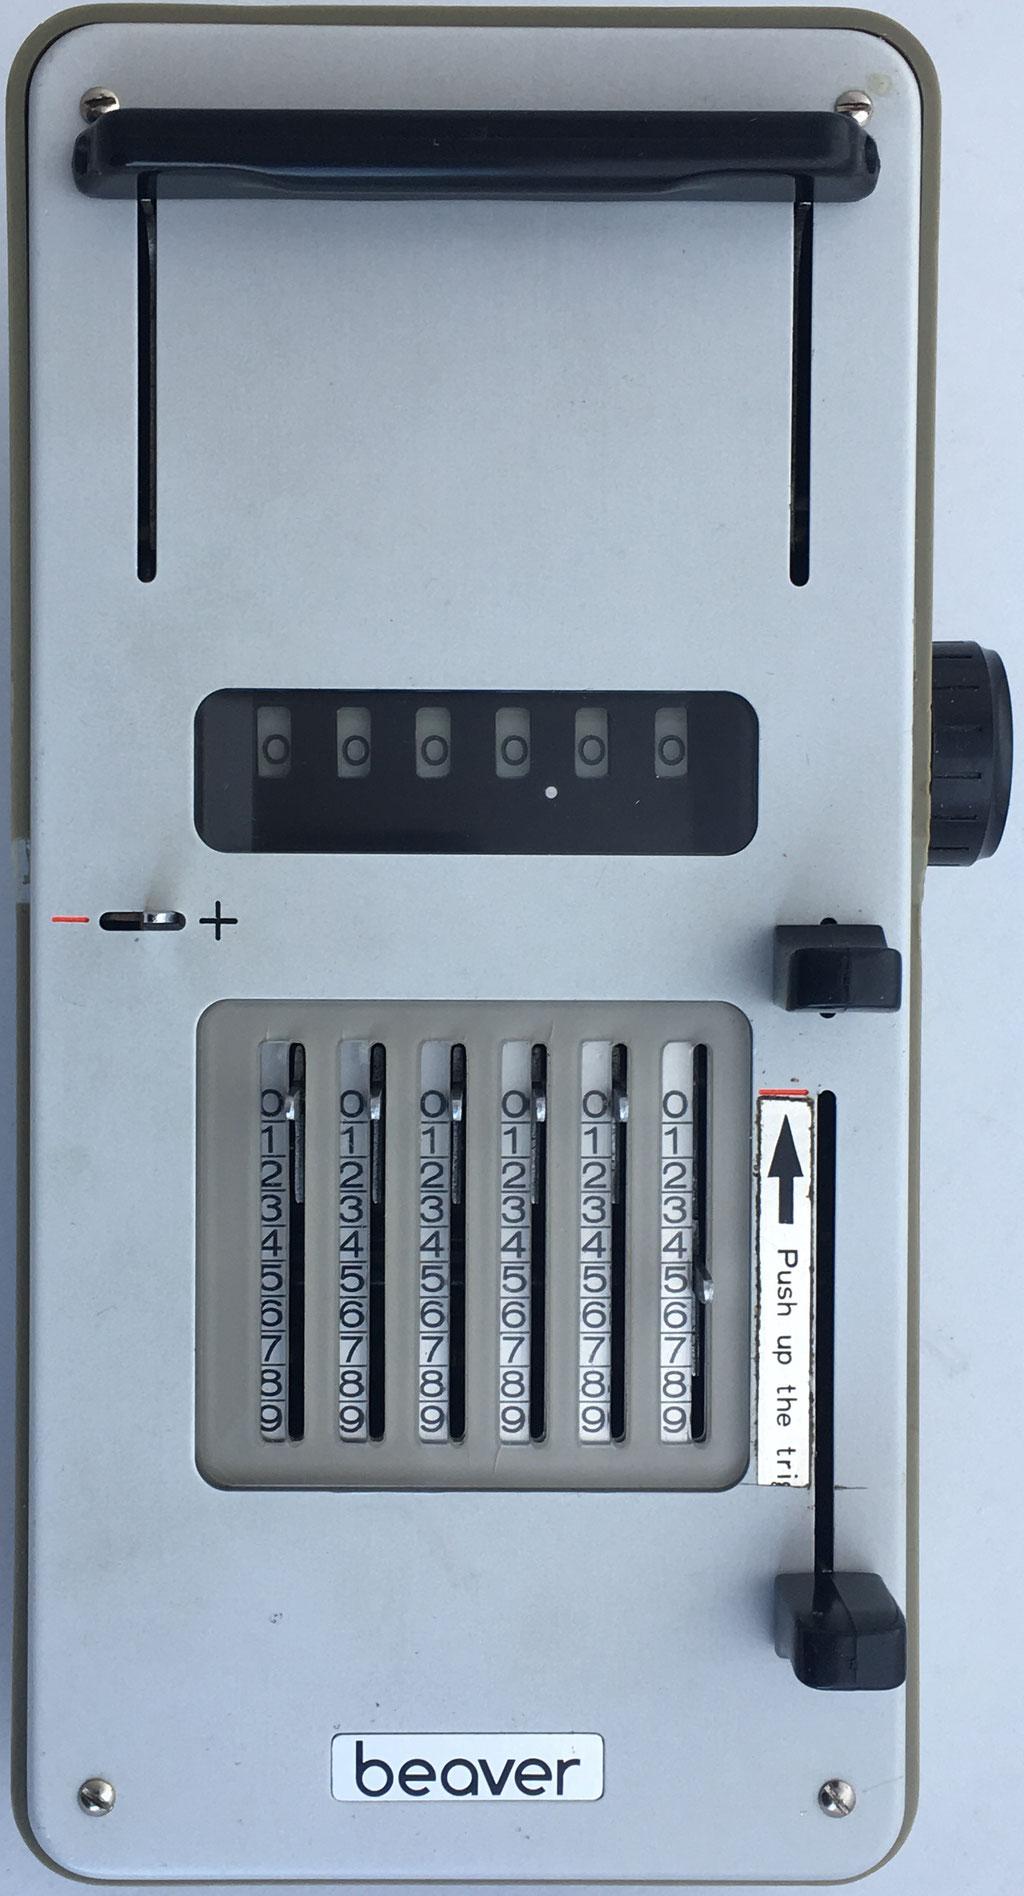 Sumadora BEAVER (segura, compacta, fácil de usar y económica), nº serie 440065, fabricada en Japón, año 1960, 21x10x5 cm